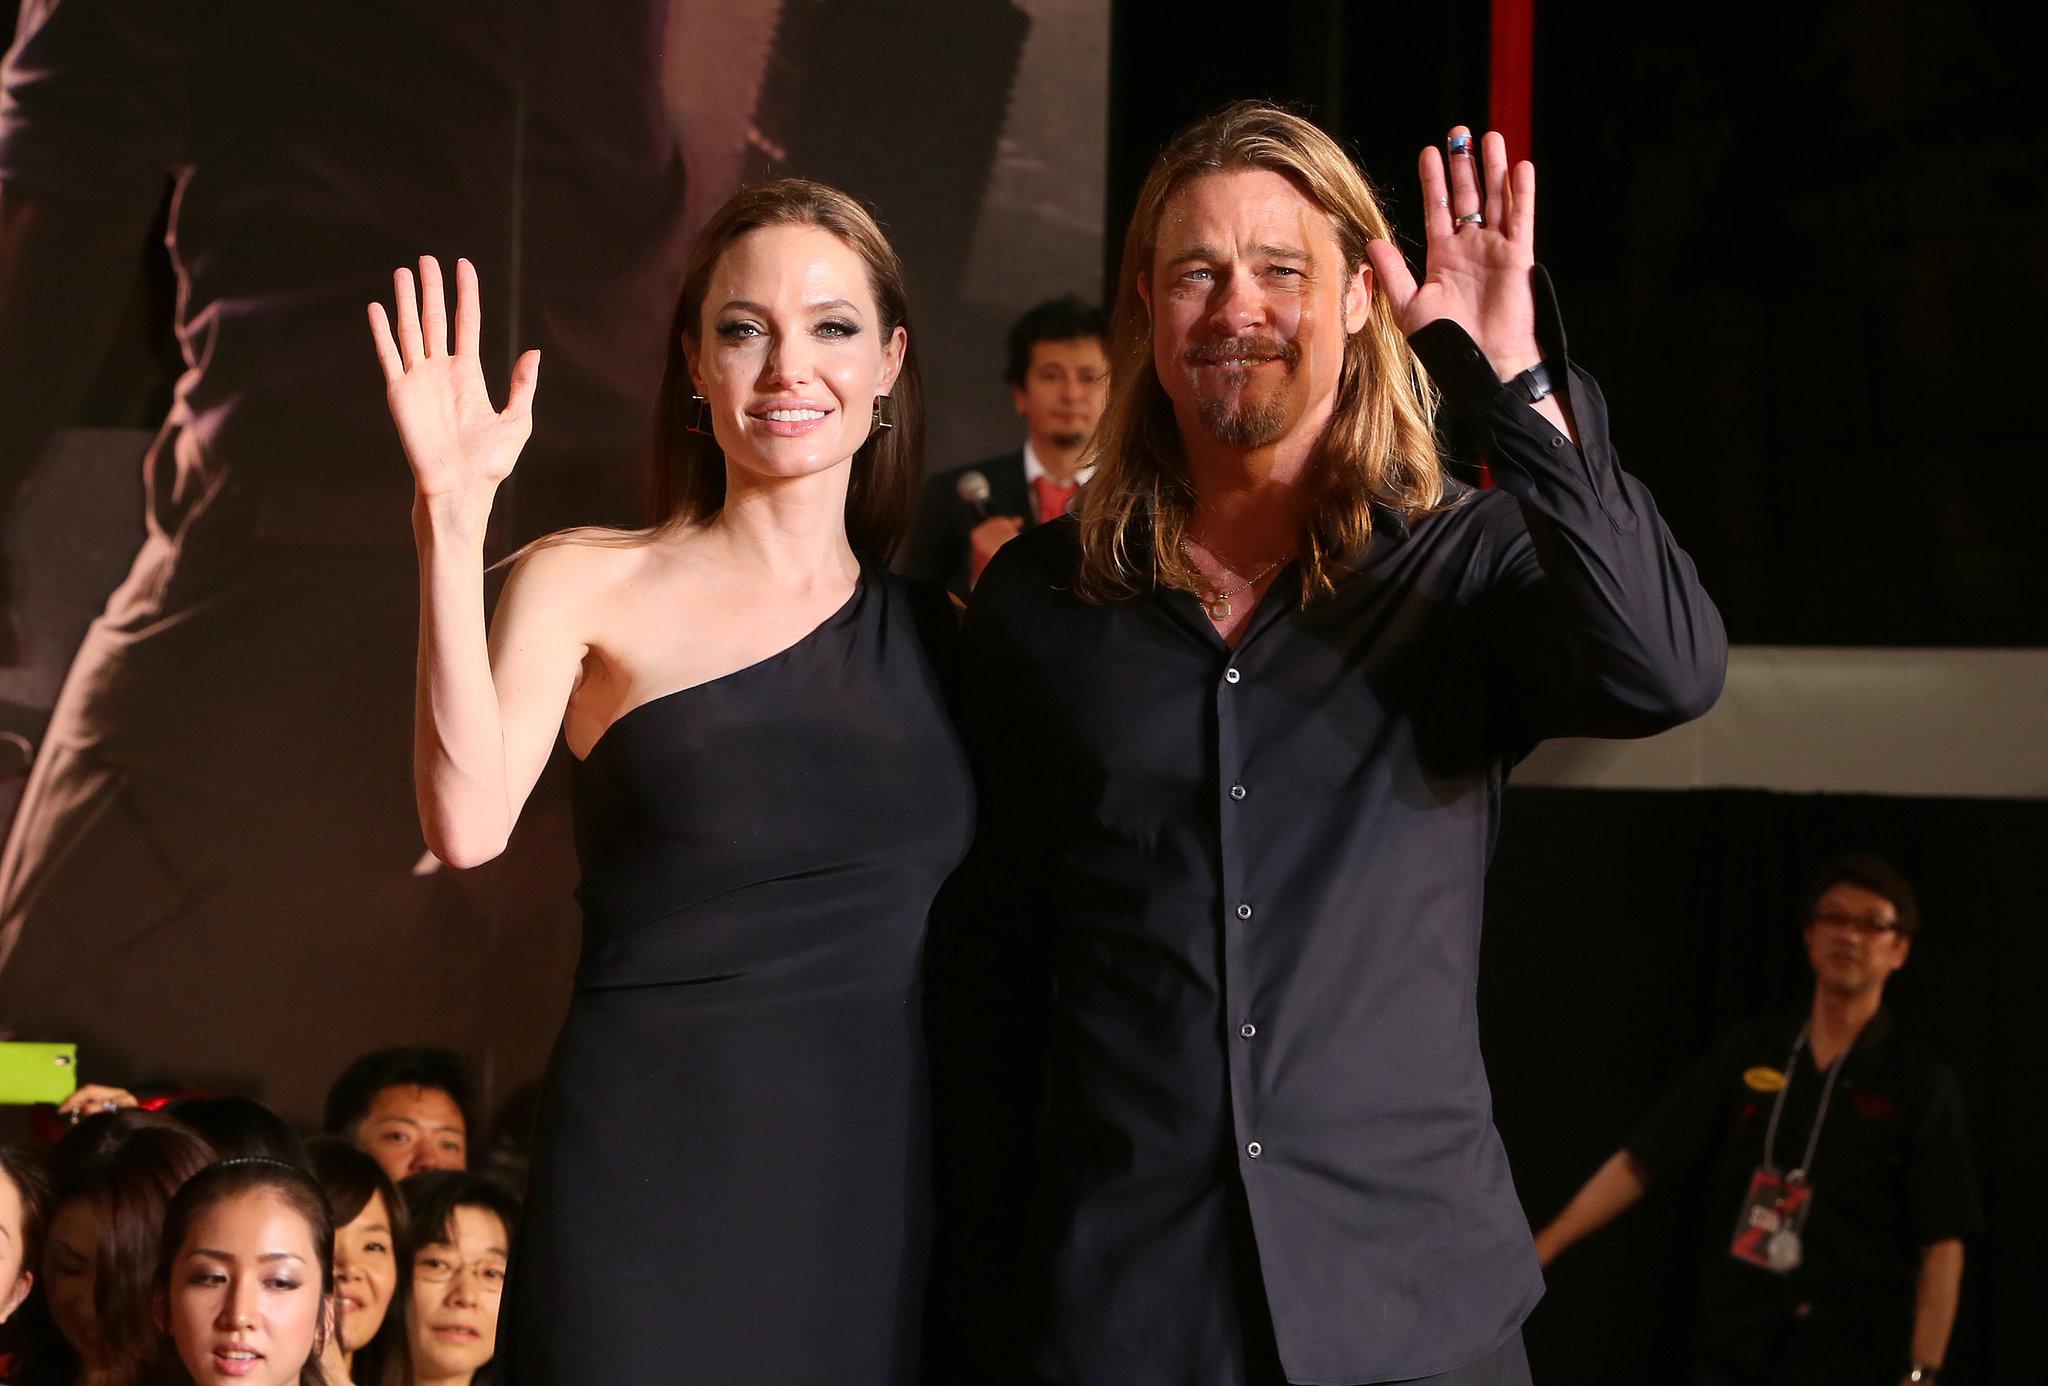 Brad Pitt and Angelina Jolie gave a wave.